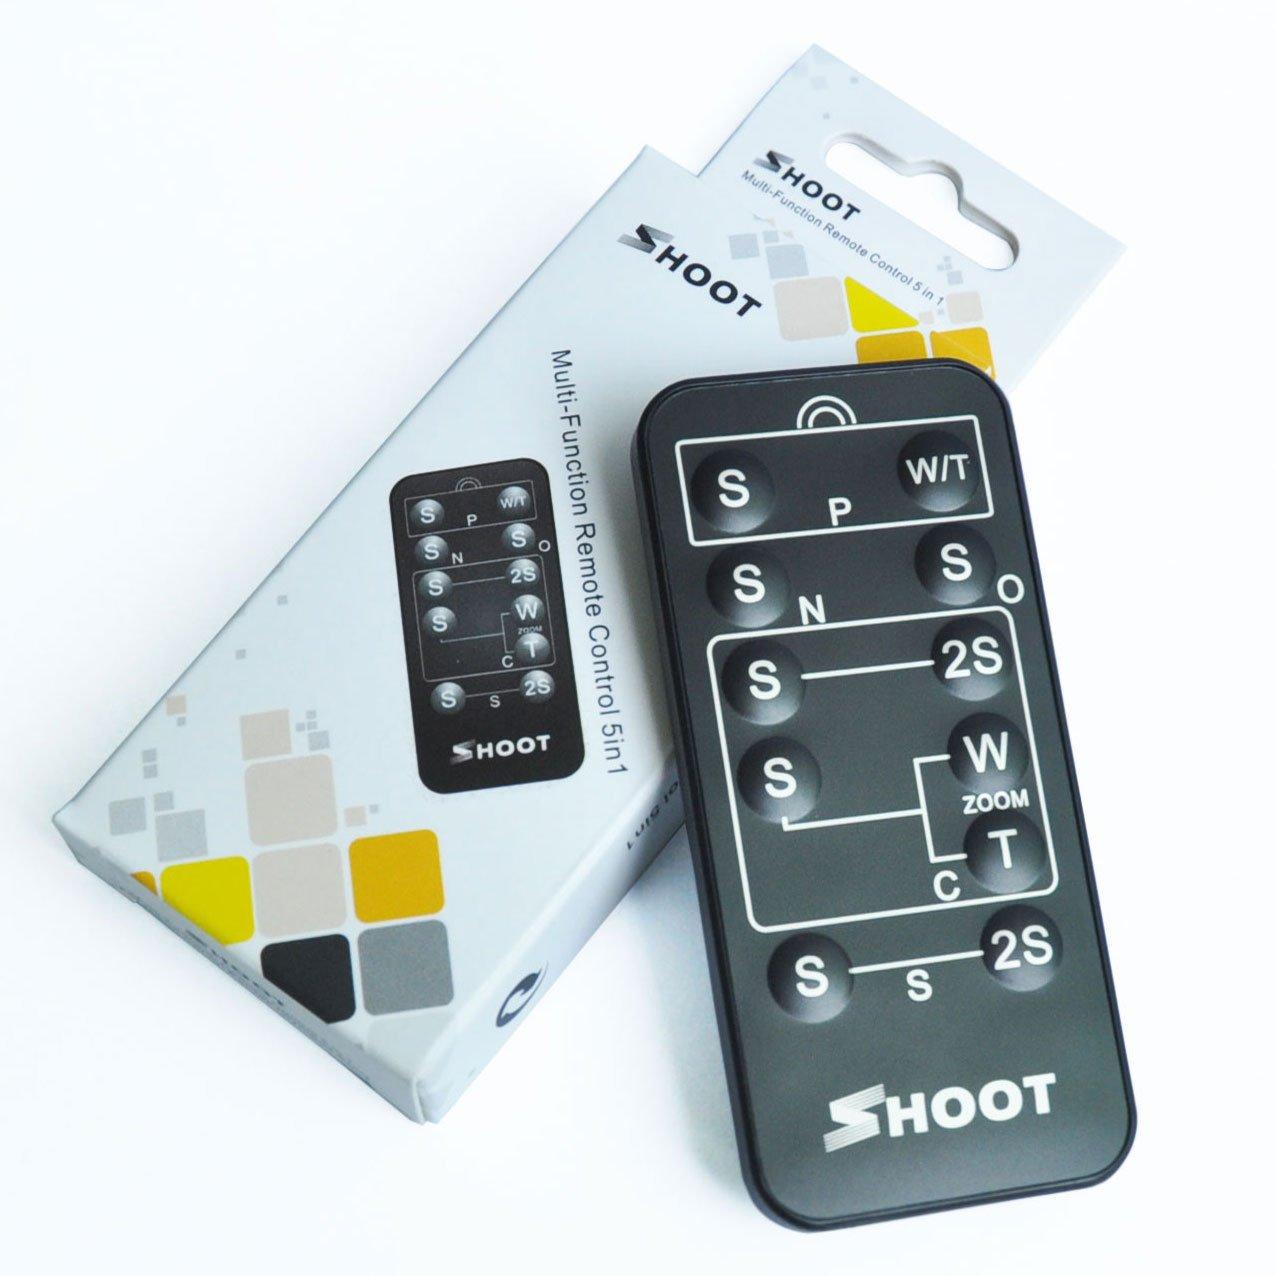 5-in-1 Remote Shutter Release for Nikon, Sony, Canon, Konica Minolta & Pentax Digital Cameras Neewer 10002213@@7